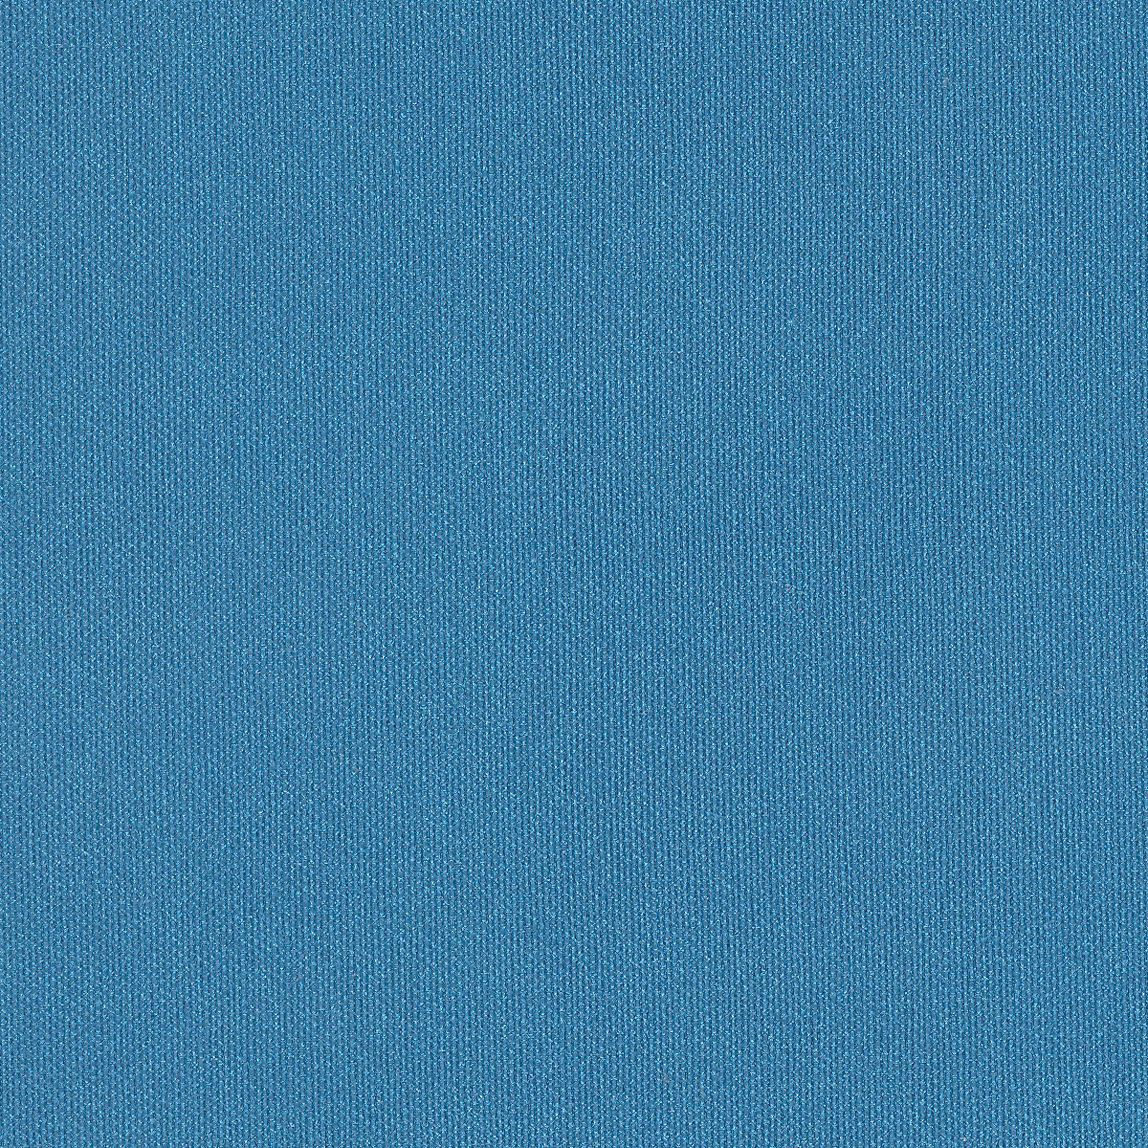 Silvertex Vinyl Turquoise Swatch